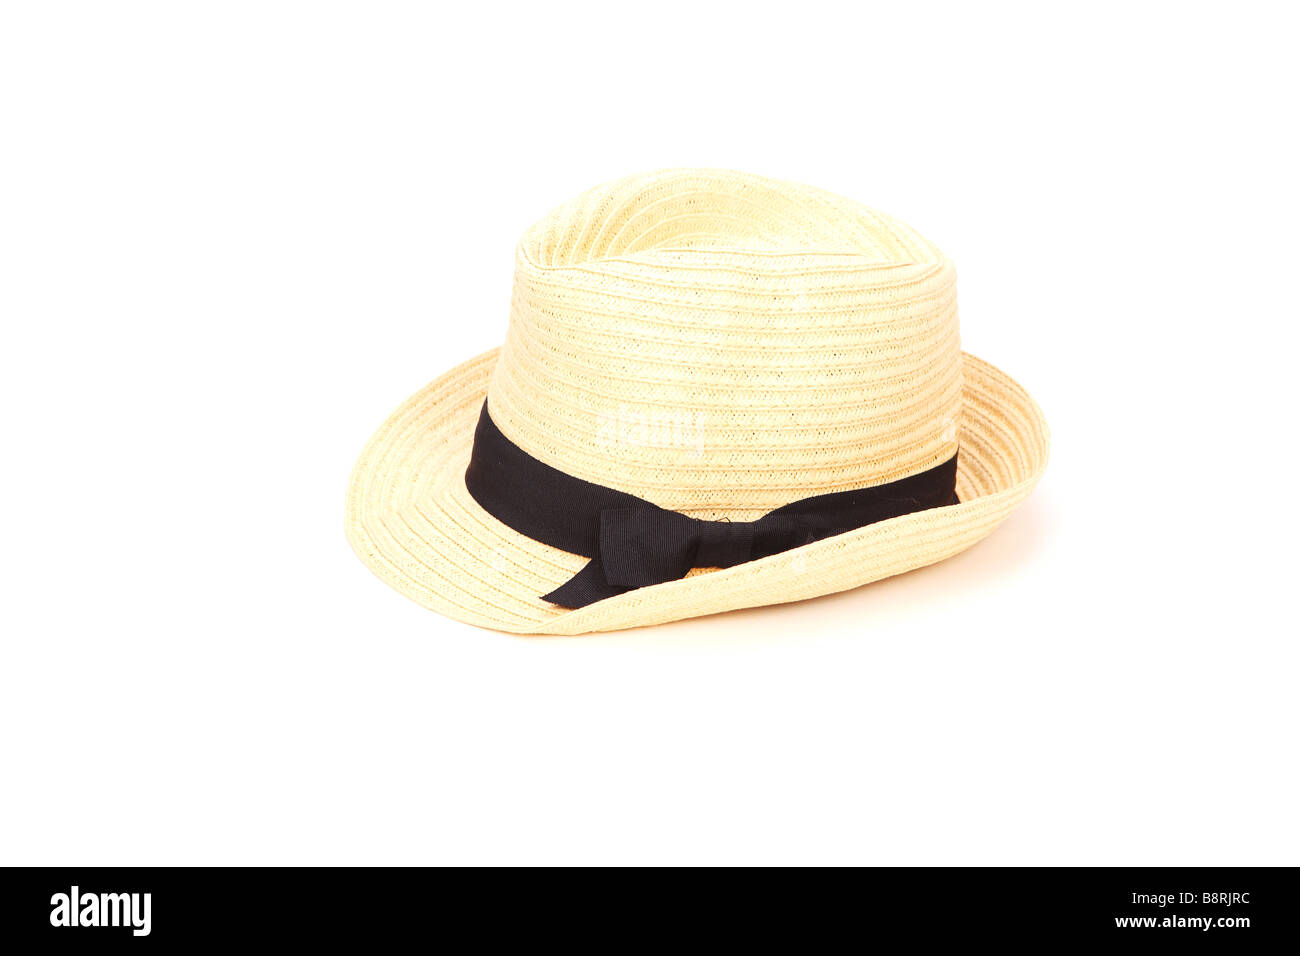 summer hat isolated on white background - Stock Image